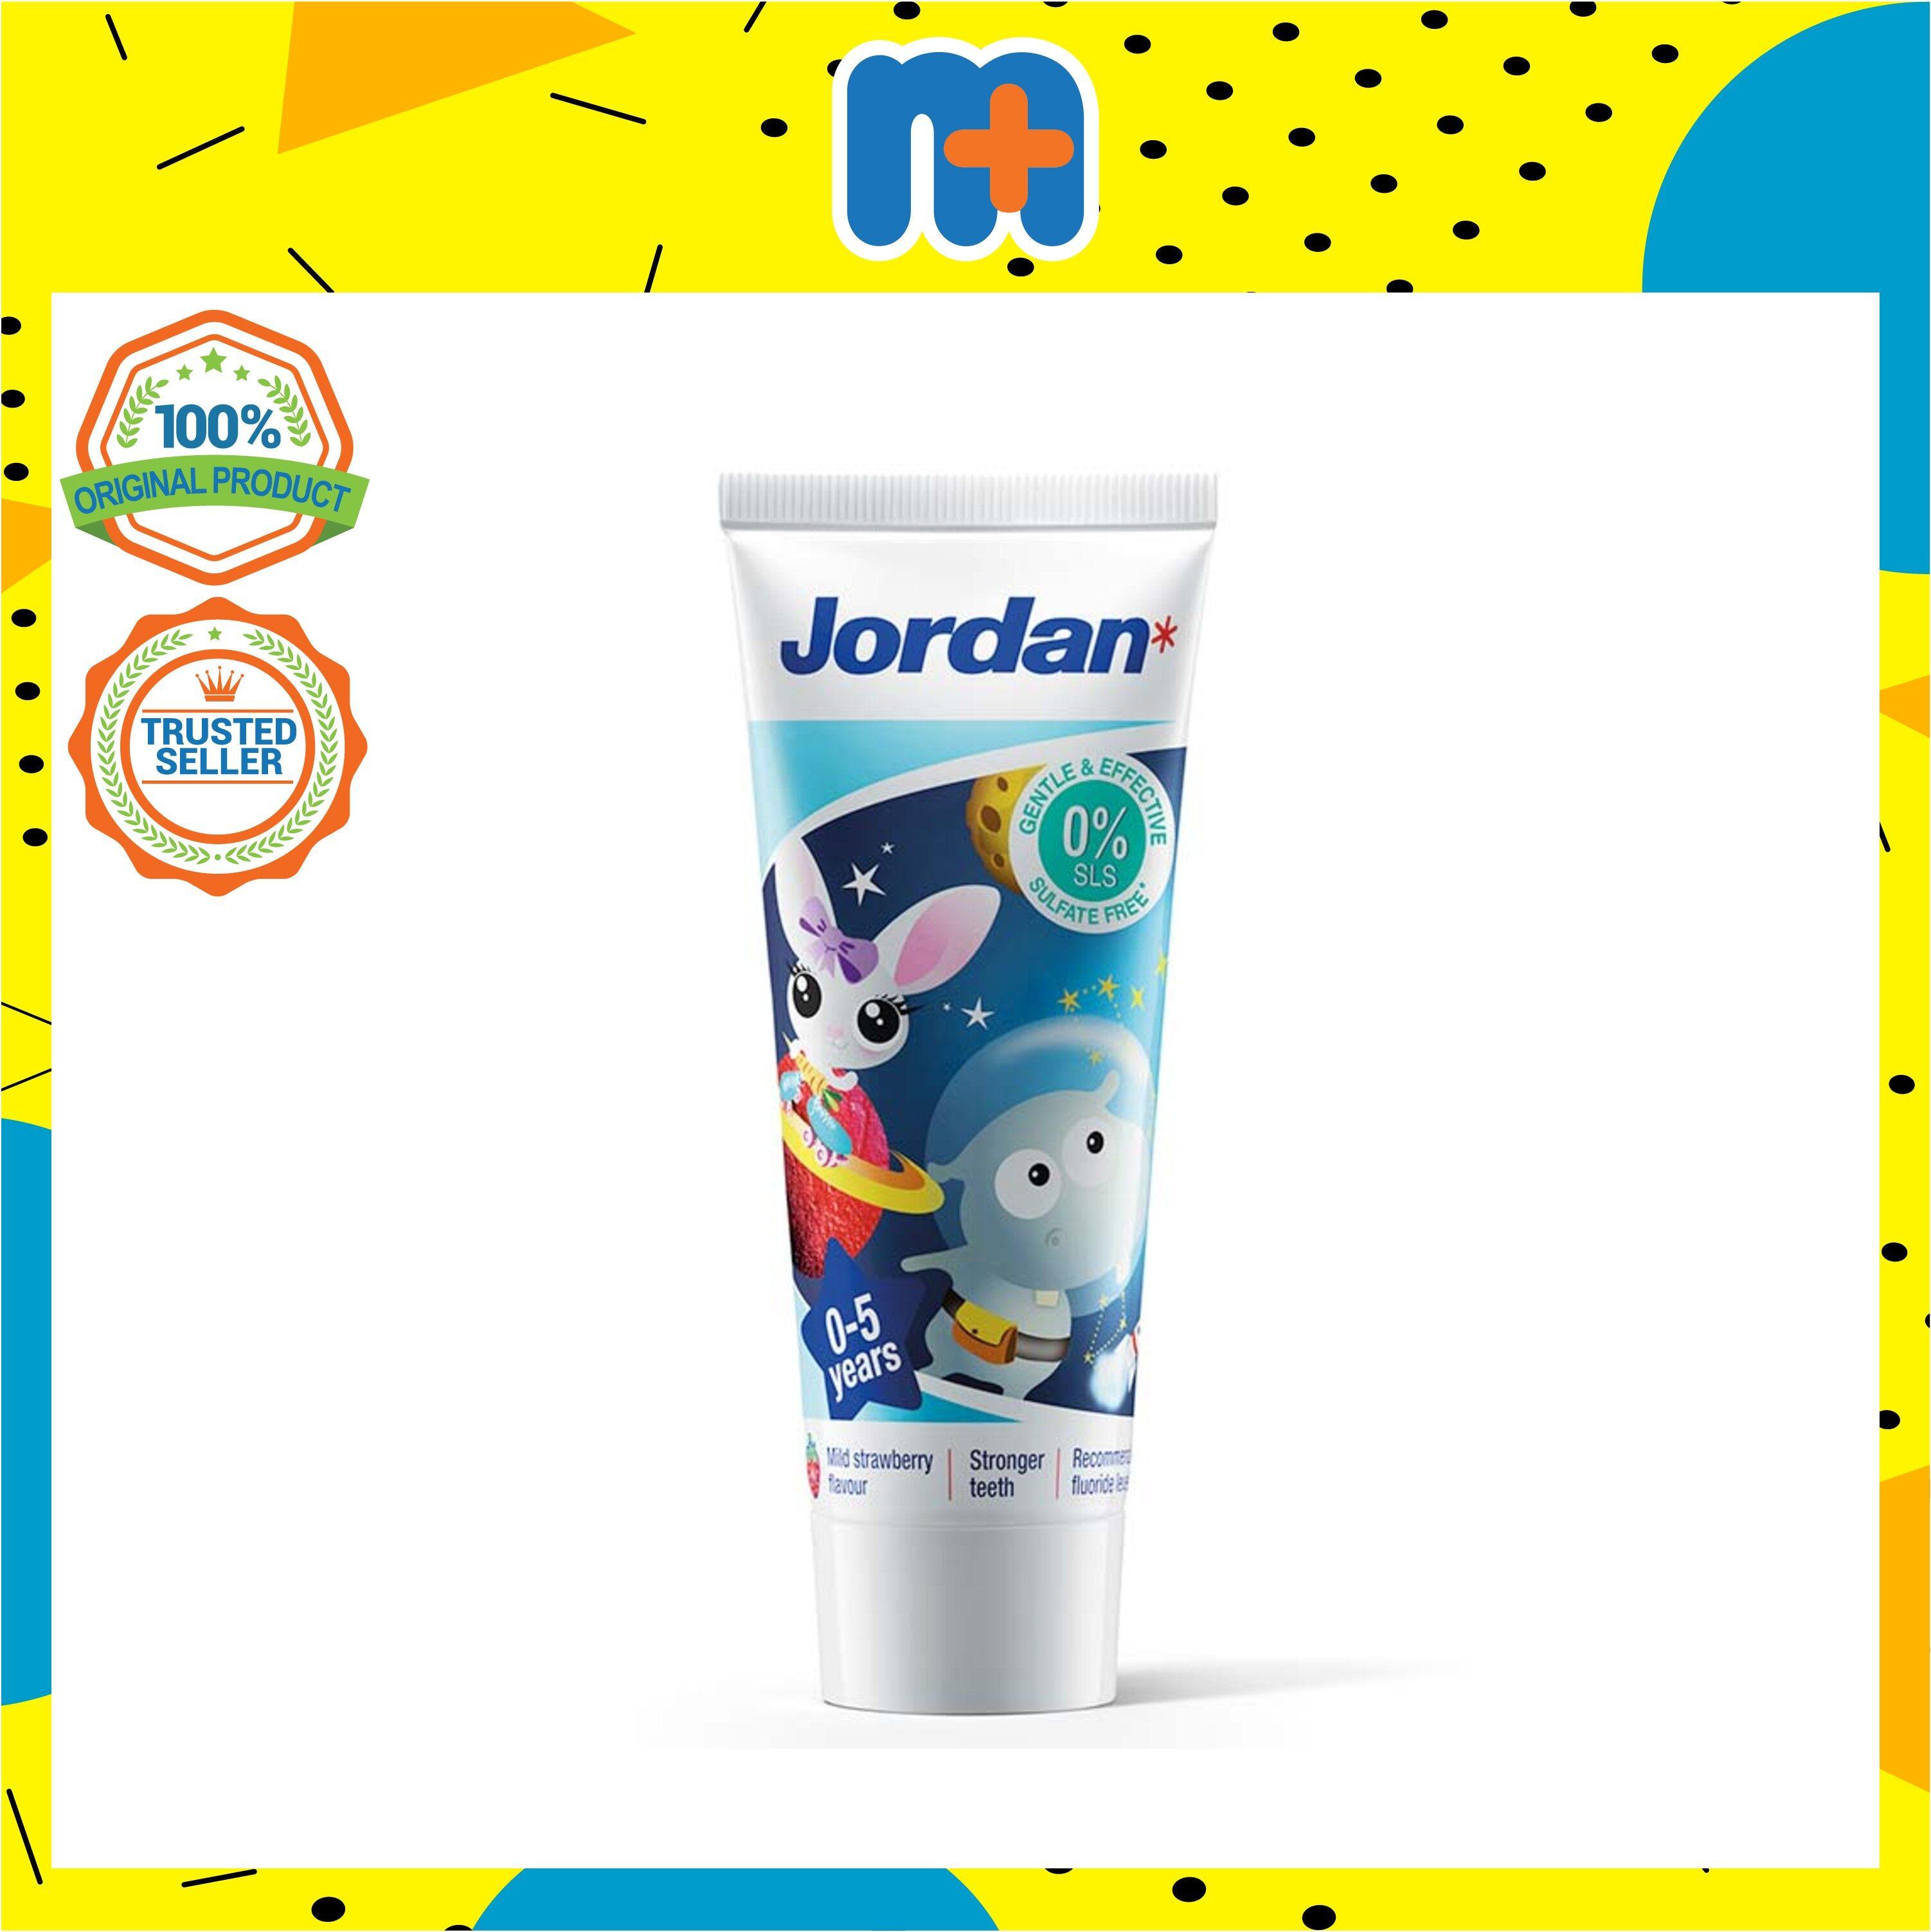 [MPLUS] JORDAN Toothpaste Step 1 [0-5]